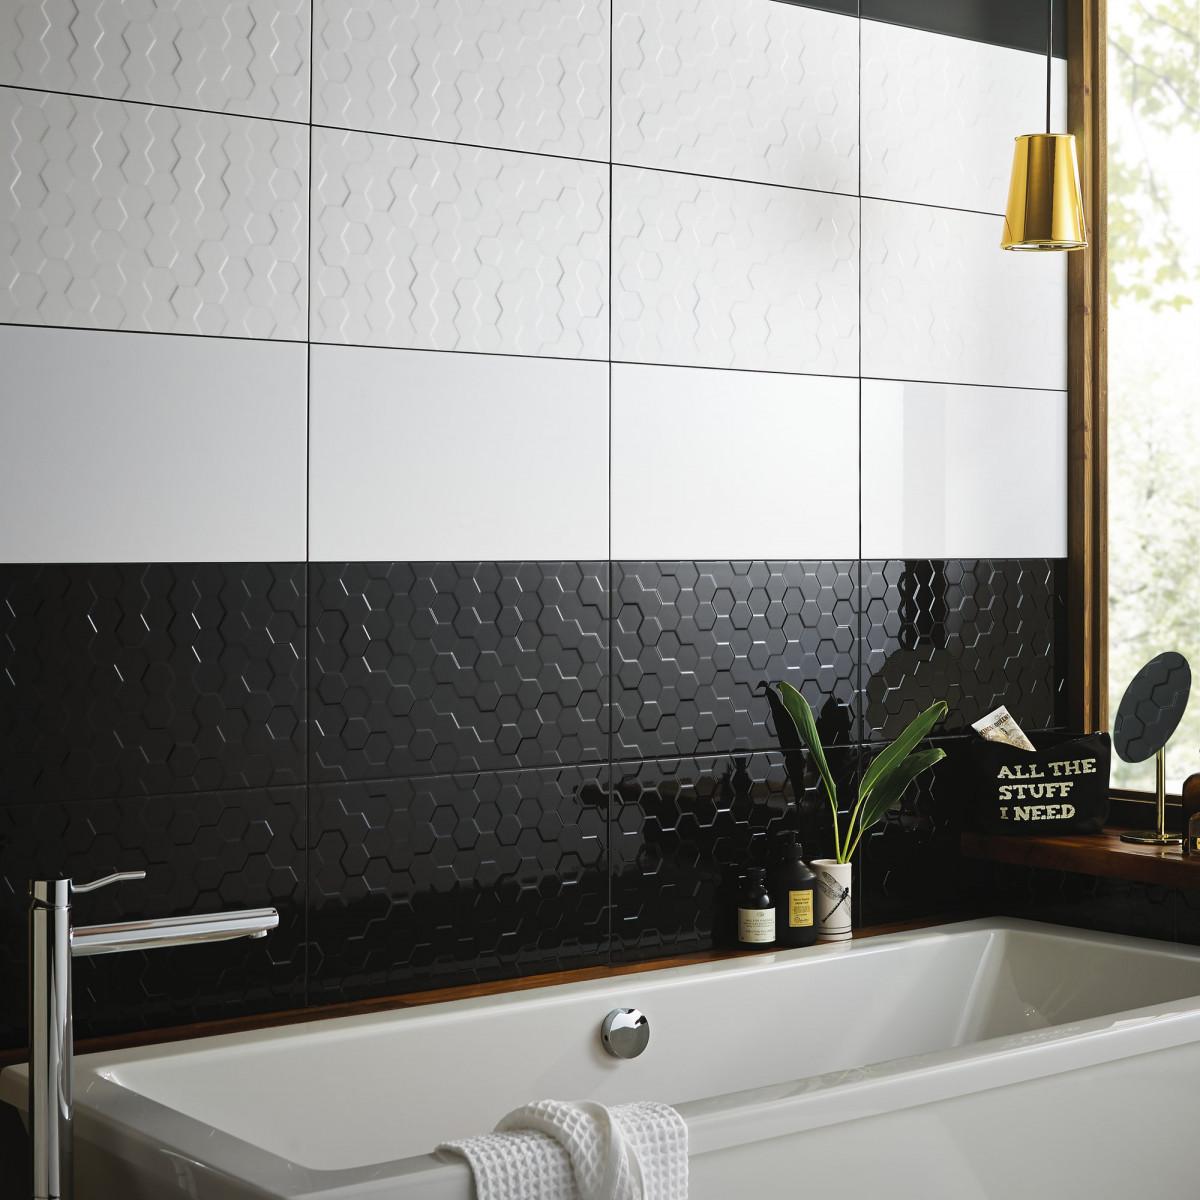 British ceramic tile images tile flooring design ideas british ceramic tile form white matt wall british ceramic tile doublecrazyfo images dailygadgetfo Images